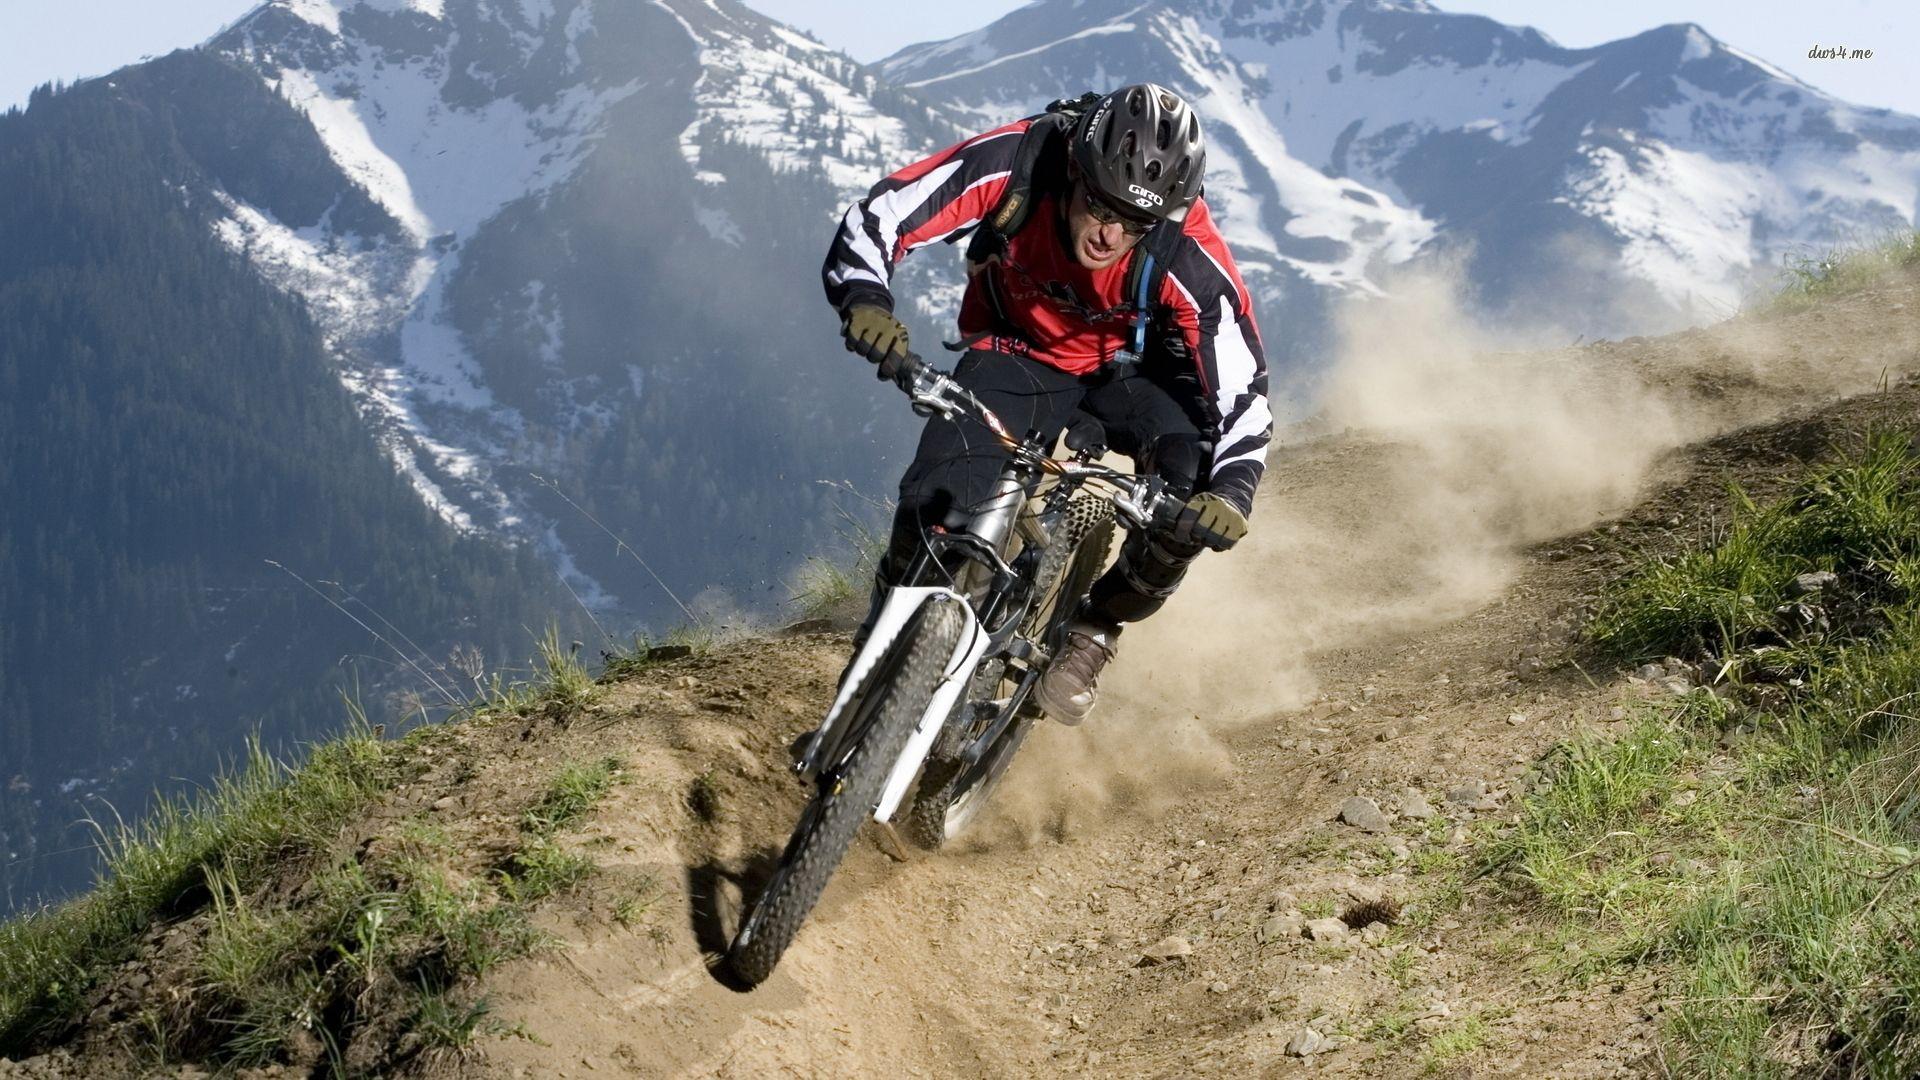 Downhill Mountain Bike Action Best Mountain Bikes Downhill